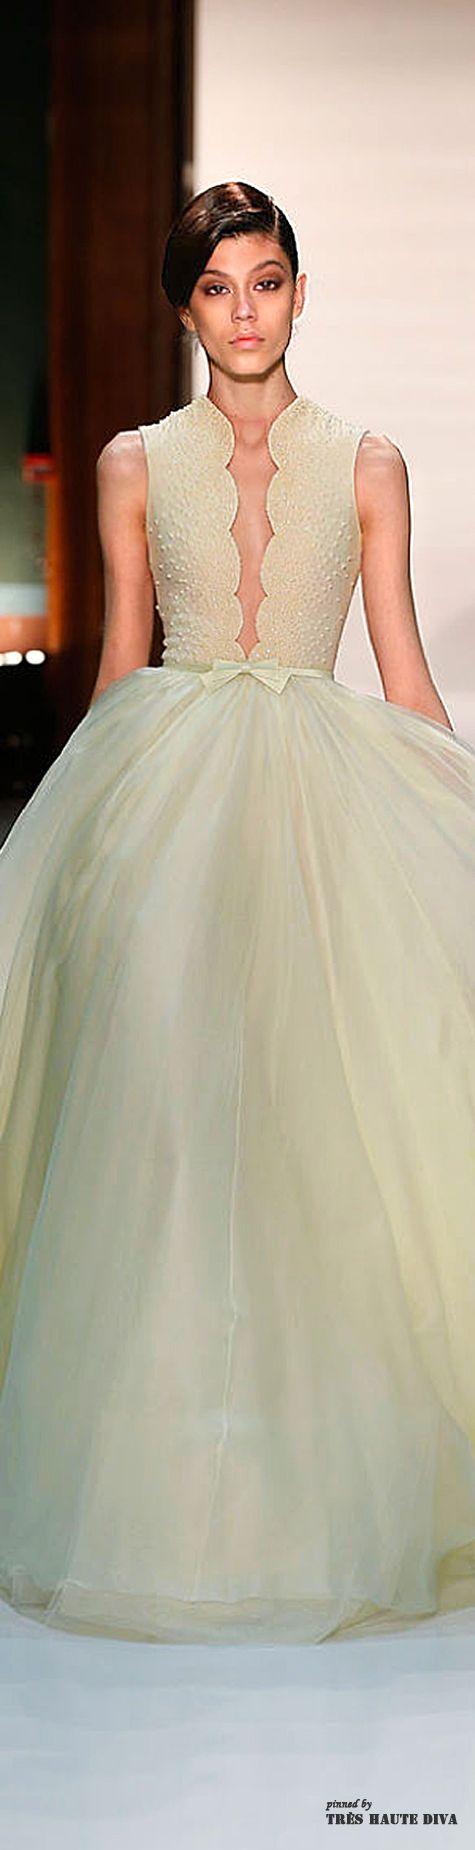 Red wedding dress meaning  Lisa Marie Kao lmkao on Pinterest